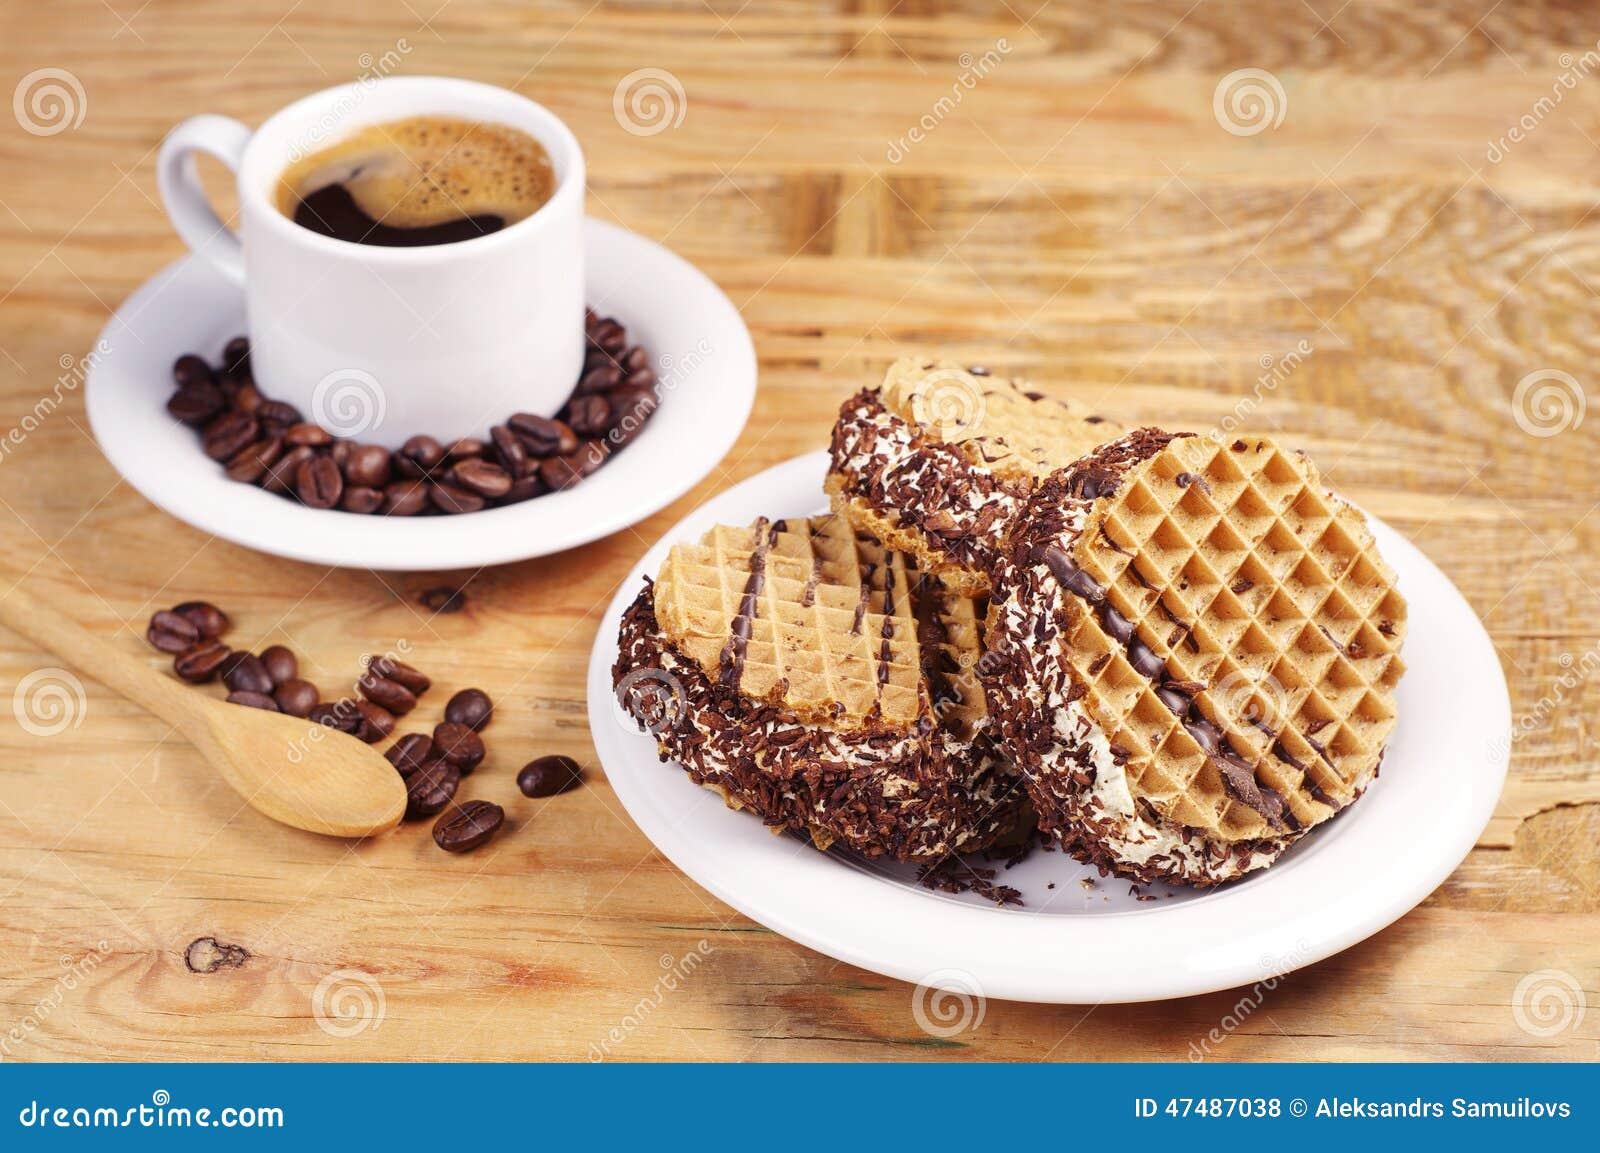 Le Chocolat De Tasse  Ef Bf Bd Caf Ef Bf Bd